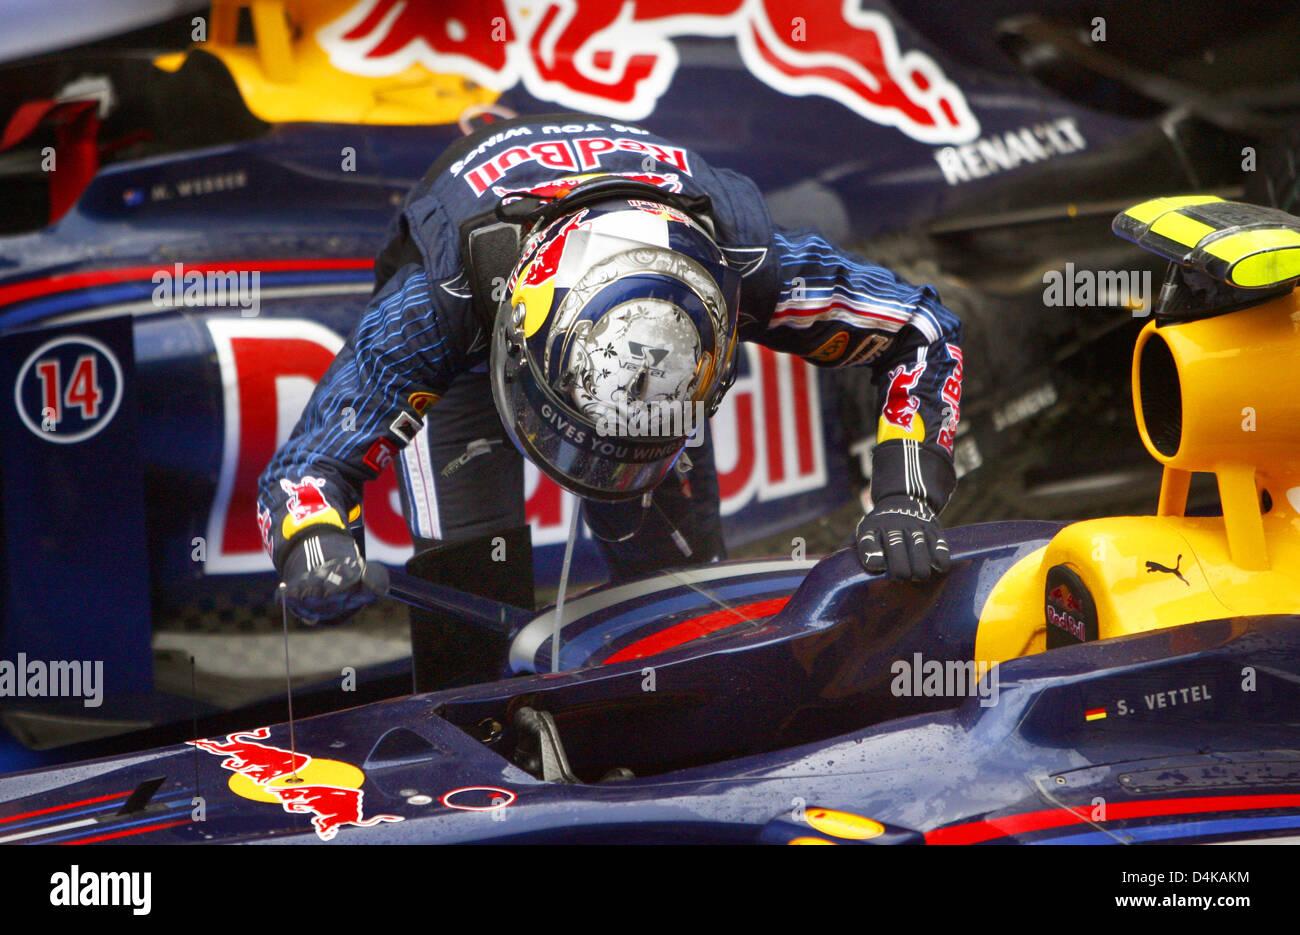 b732be68 German Formula One driver Sebastian Vettel of Red Bull Racing celebrates  winning the 2009 Formula 1 Chinese Grand Prix at Shanghai International  Circuit ...